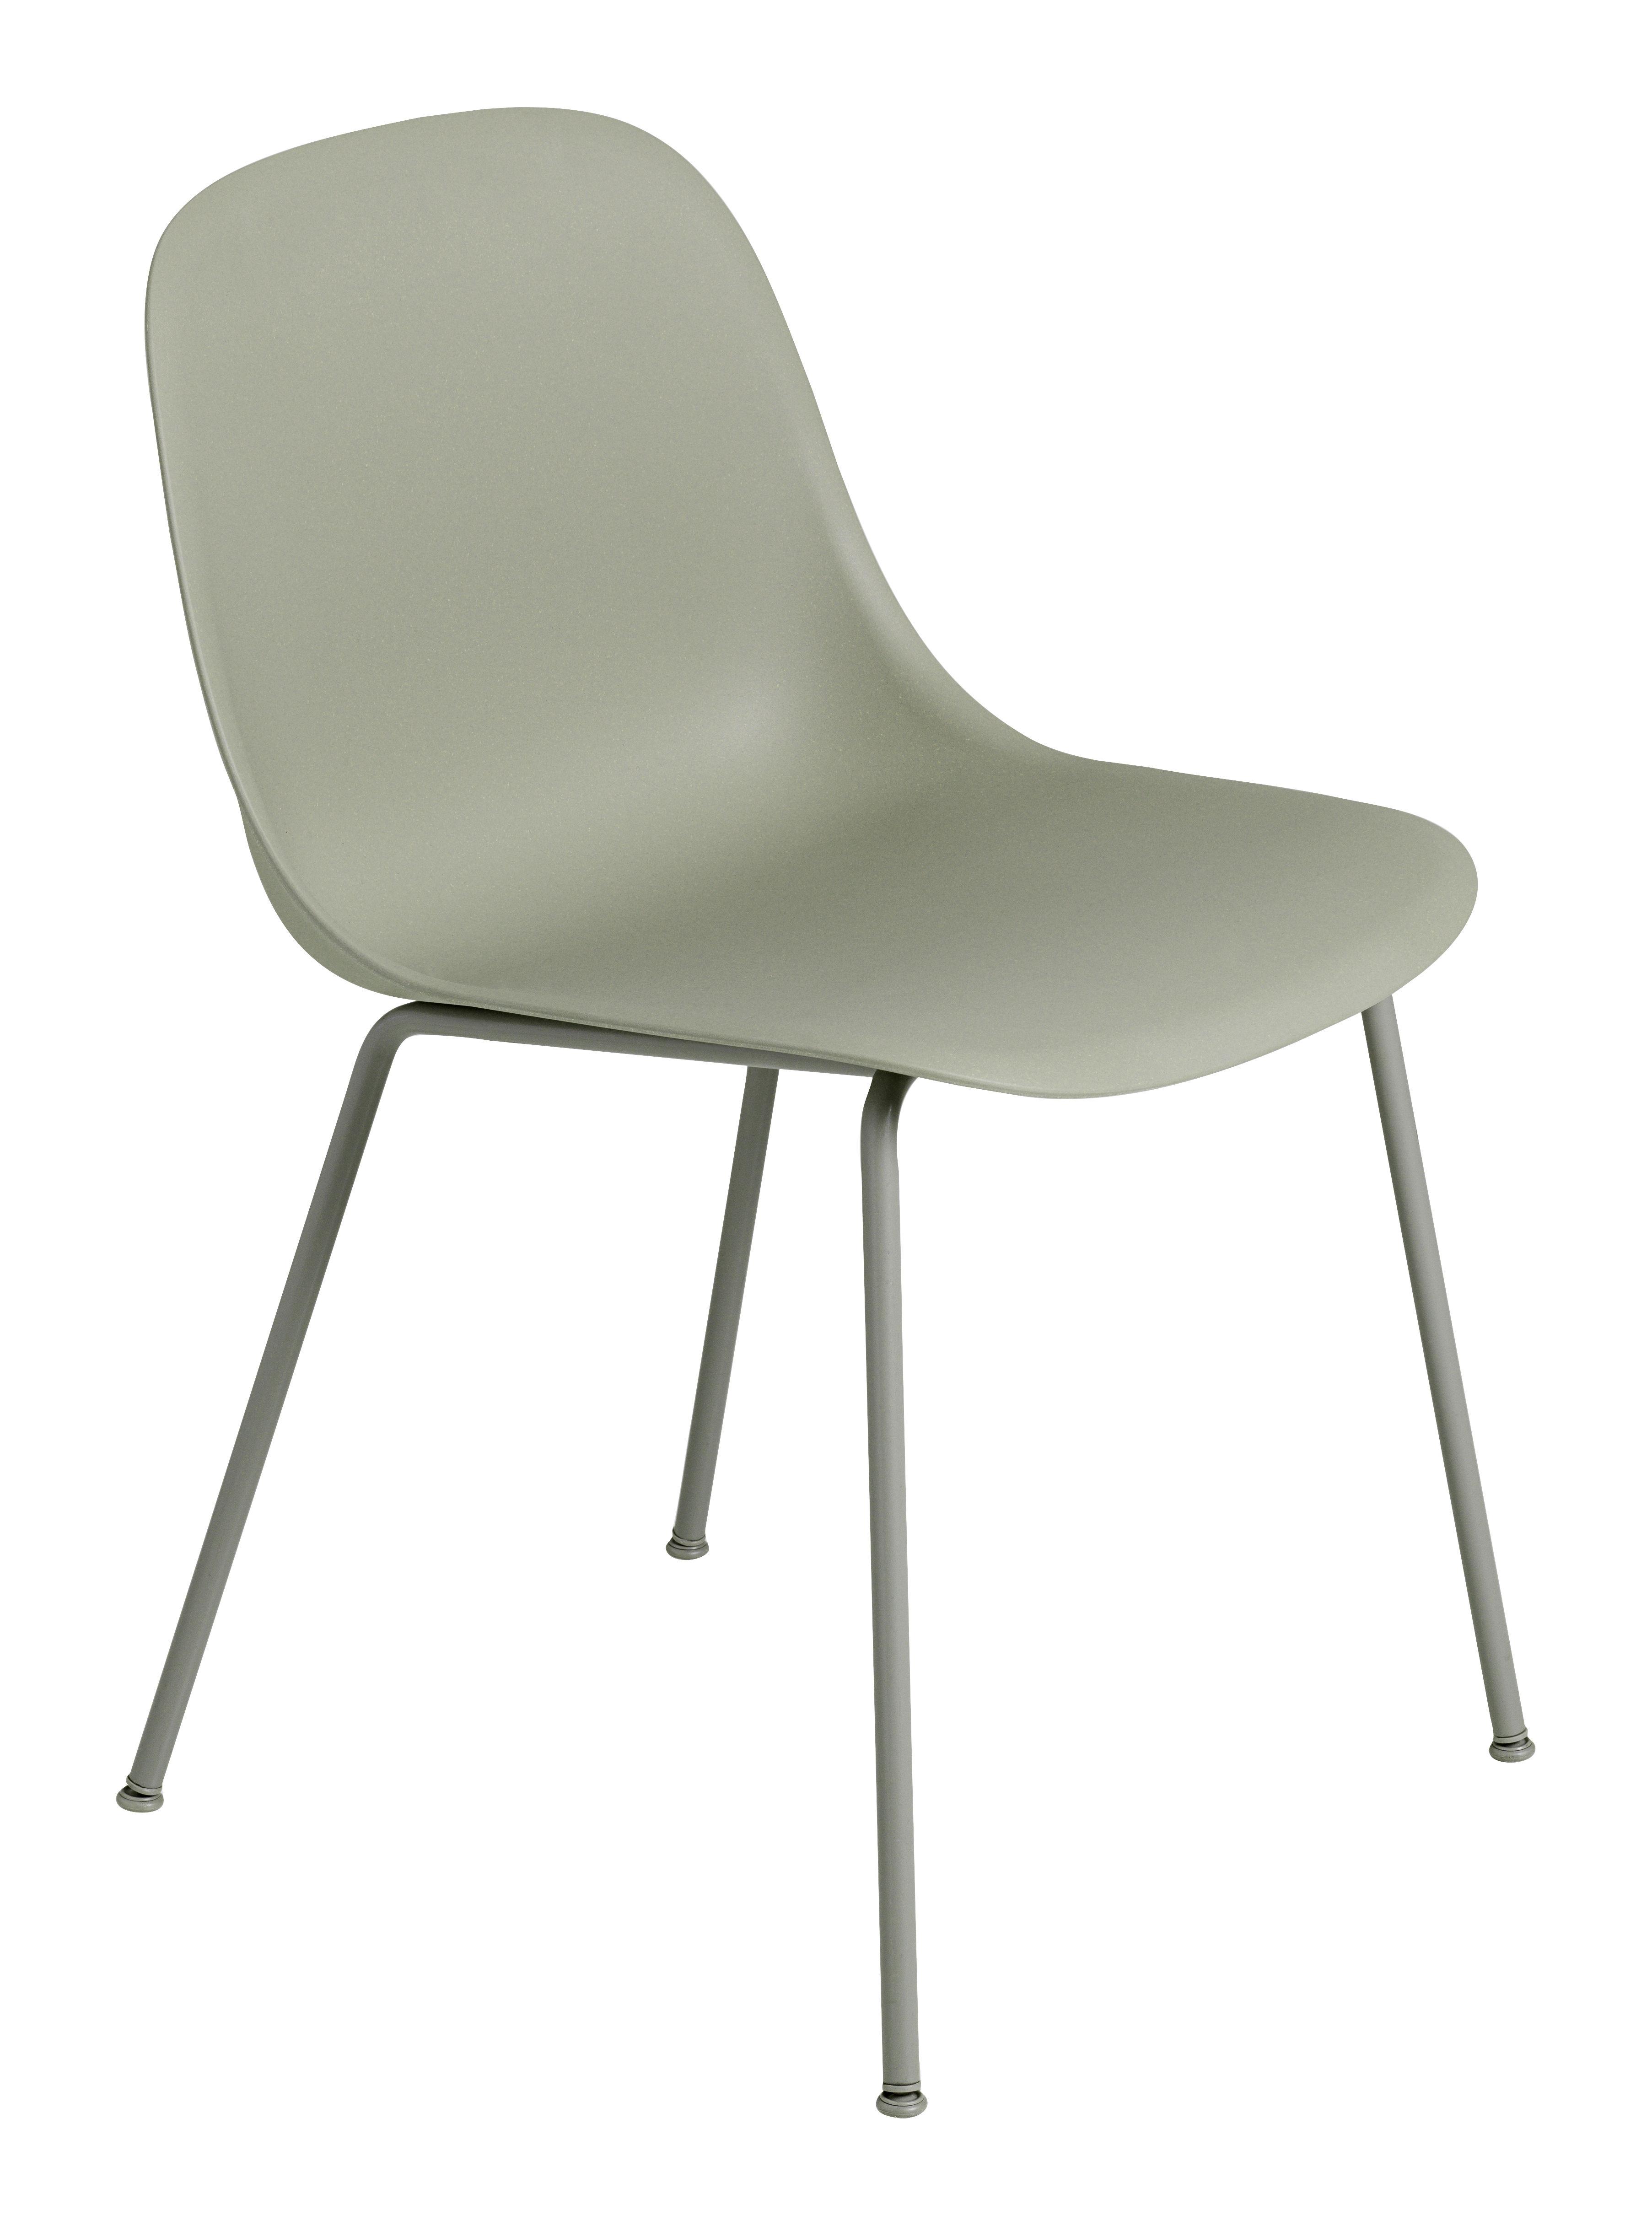 Möbel - Stühle  - Fiber Stuhl / 4-beinig, Stuhlbeine aus Metall - Muuto - Grün / Stuhlbeine grün - Recyceltes Verbundmaterial, Stahl